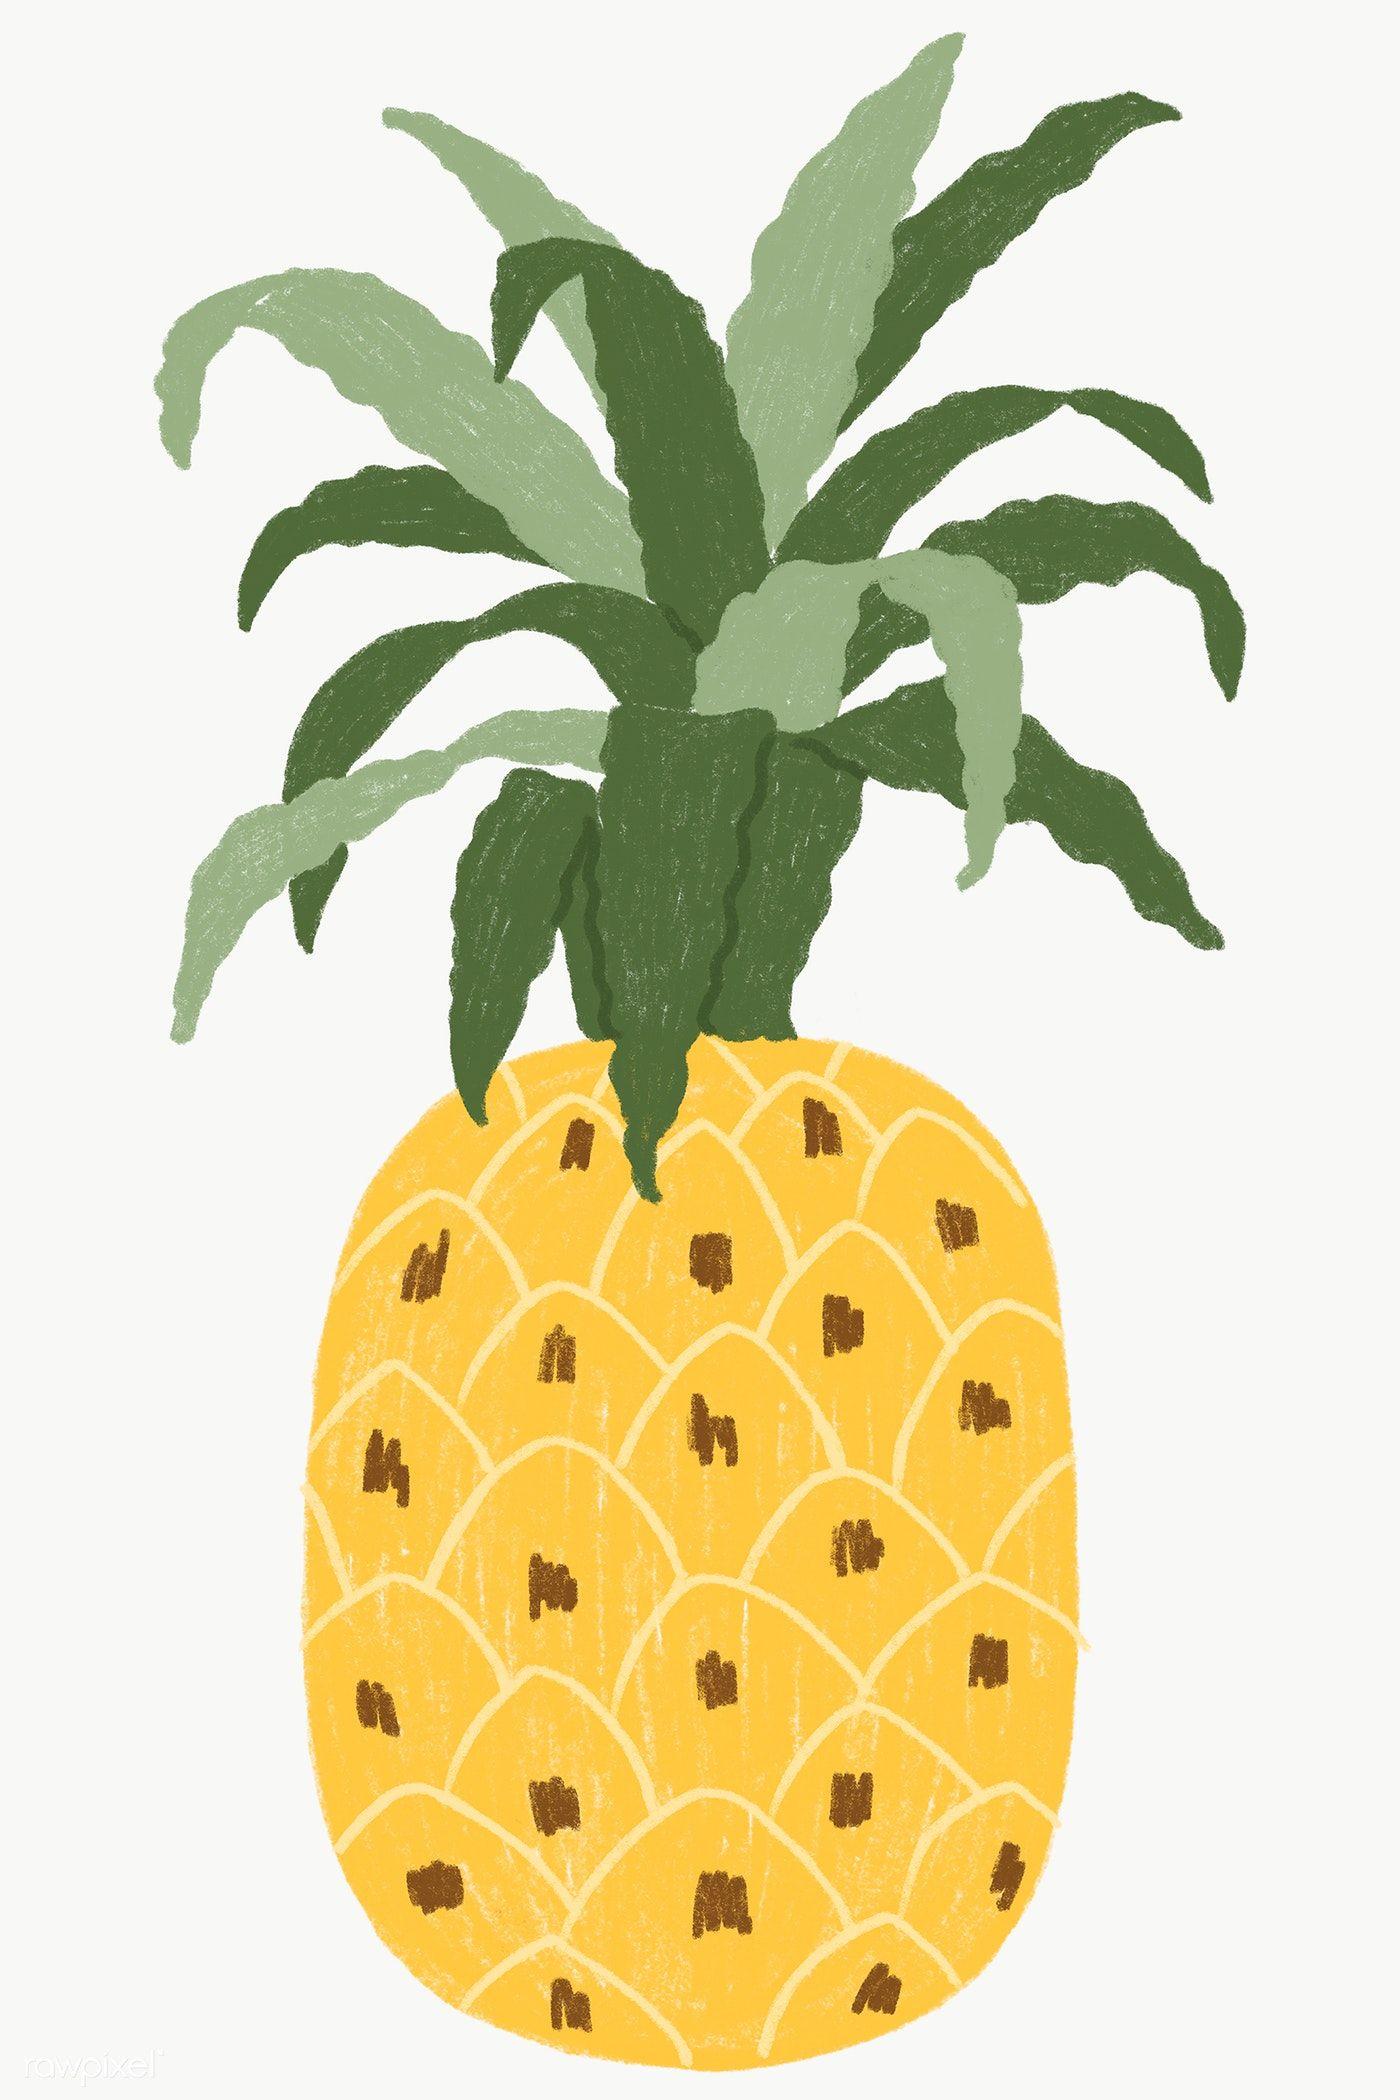 Download Premium Png Of Hand Drawn Pineapple Design Resource Transparent ในป 2020